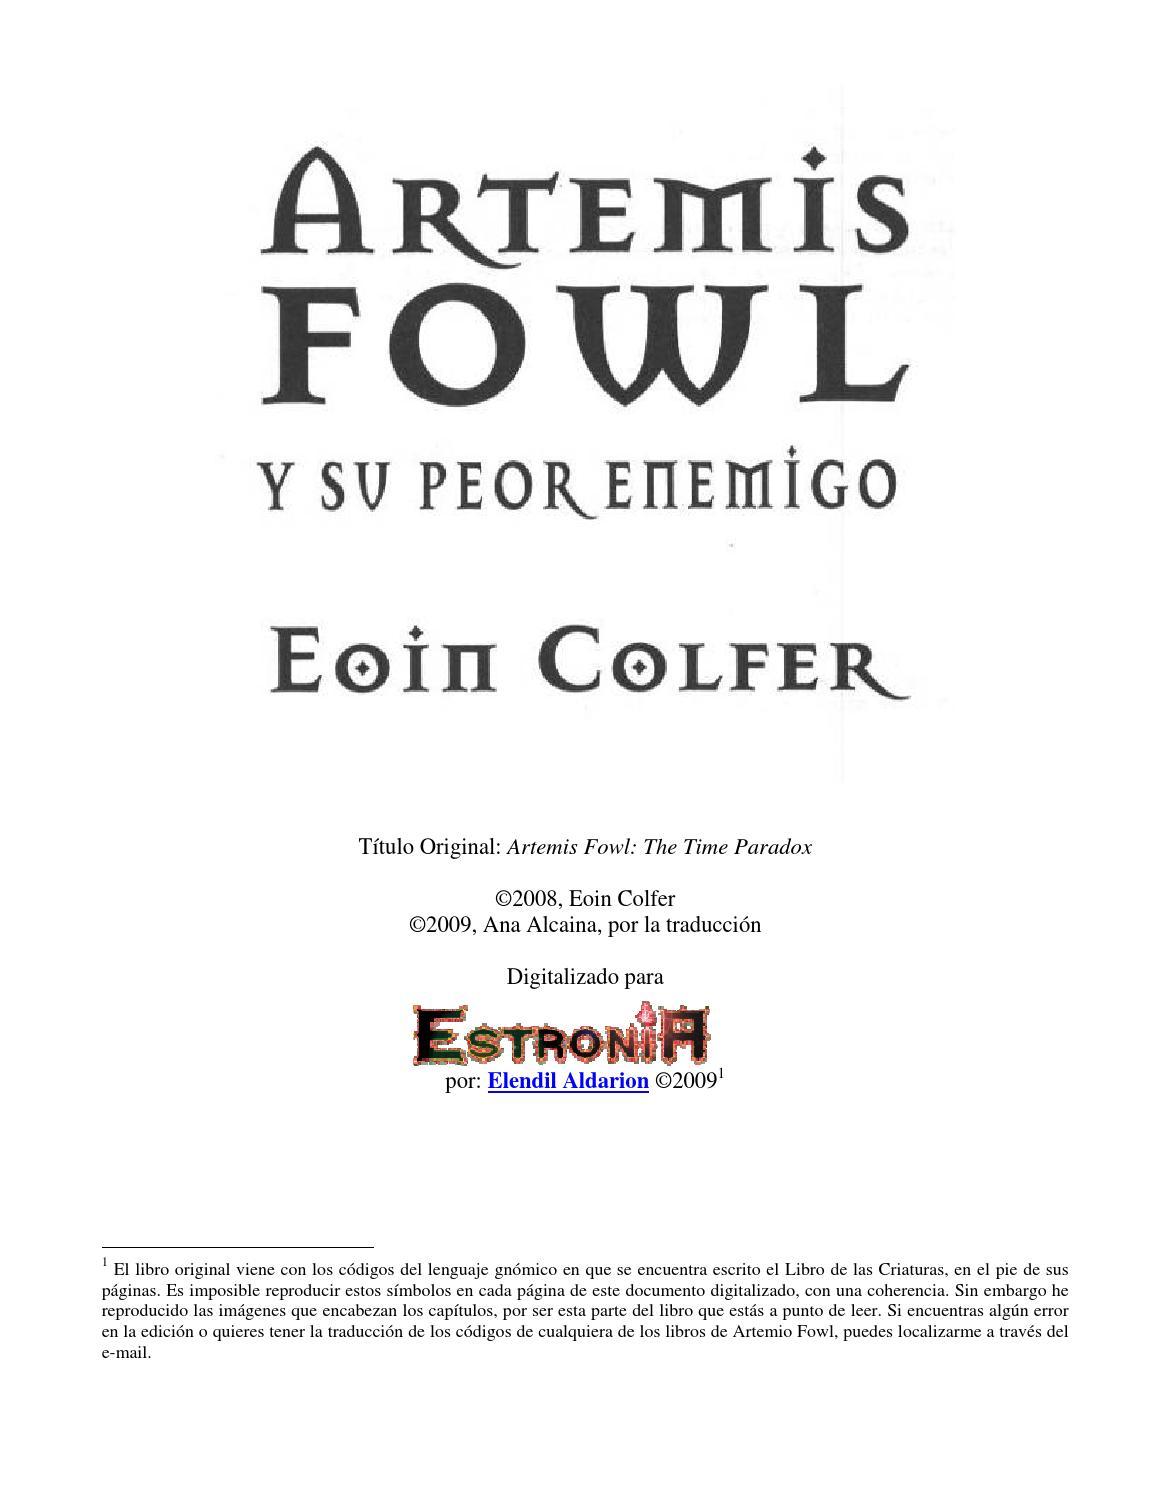 Fowl 06 by alfredo benavidez - issuu 757fd8d52fb